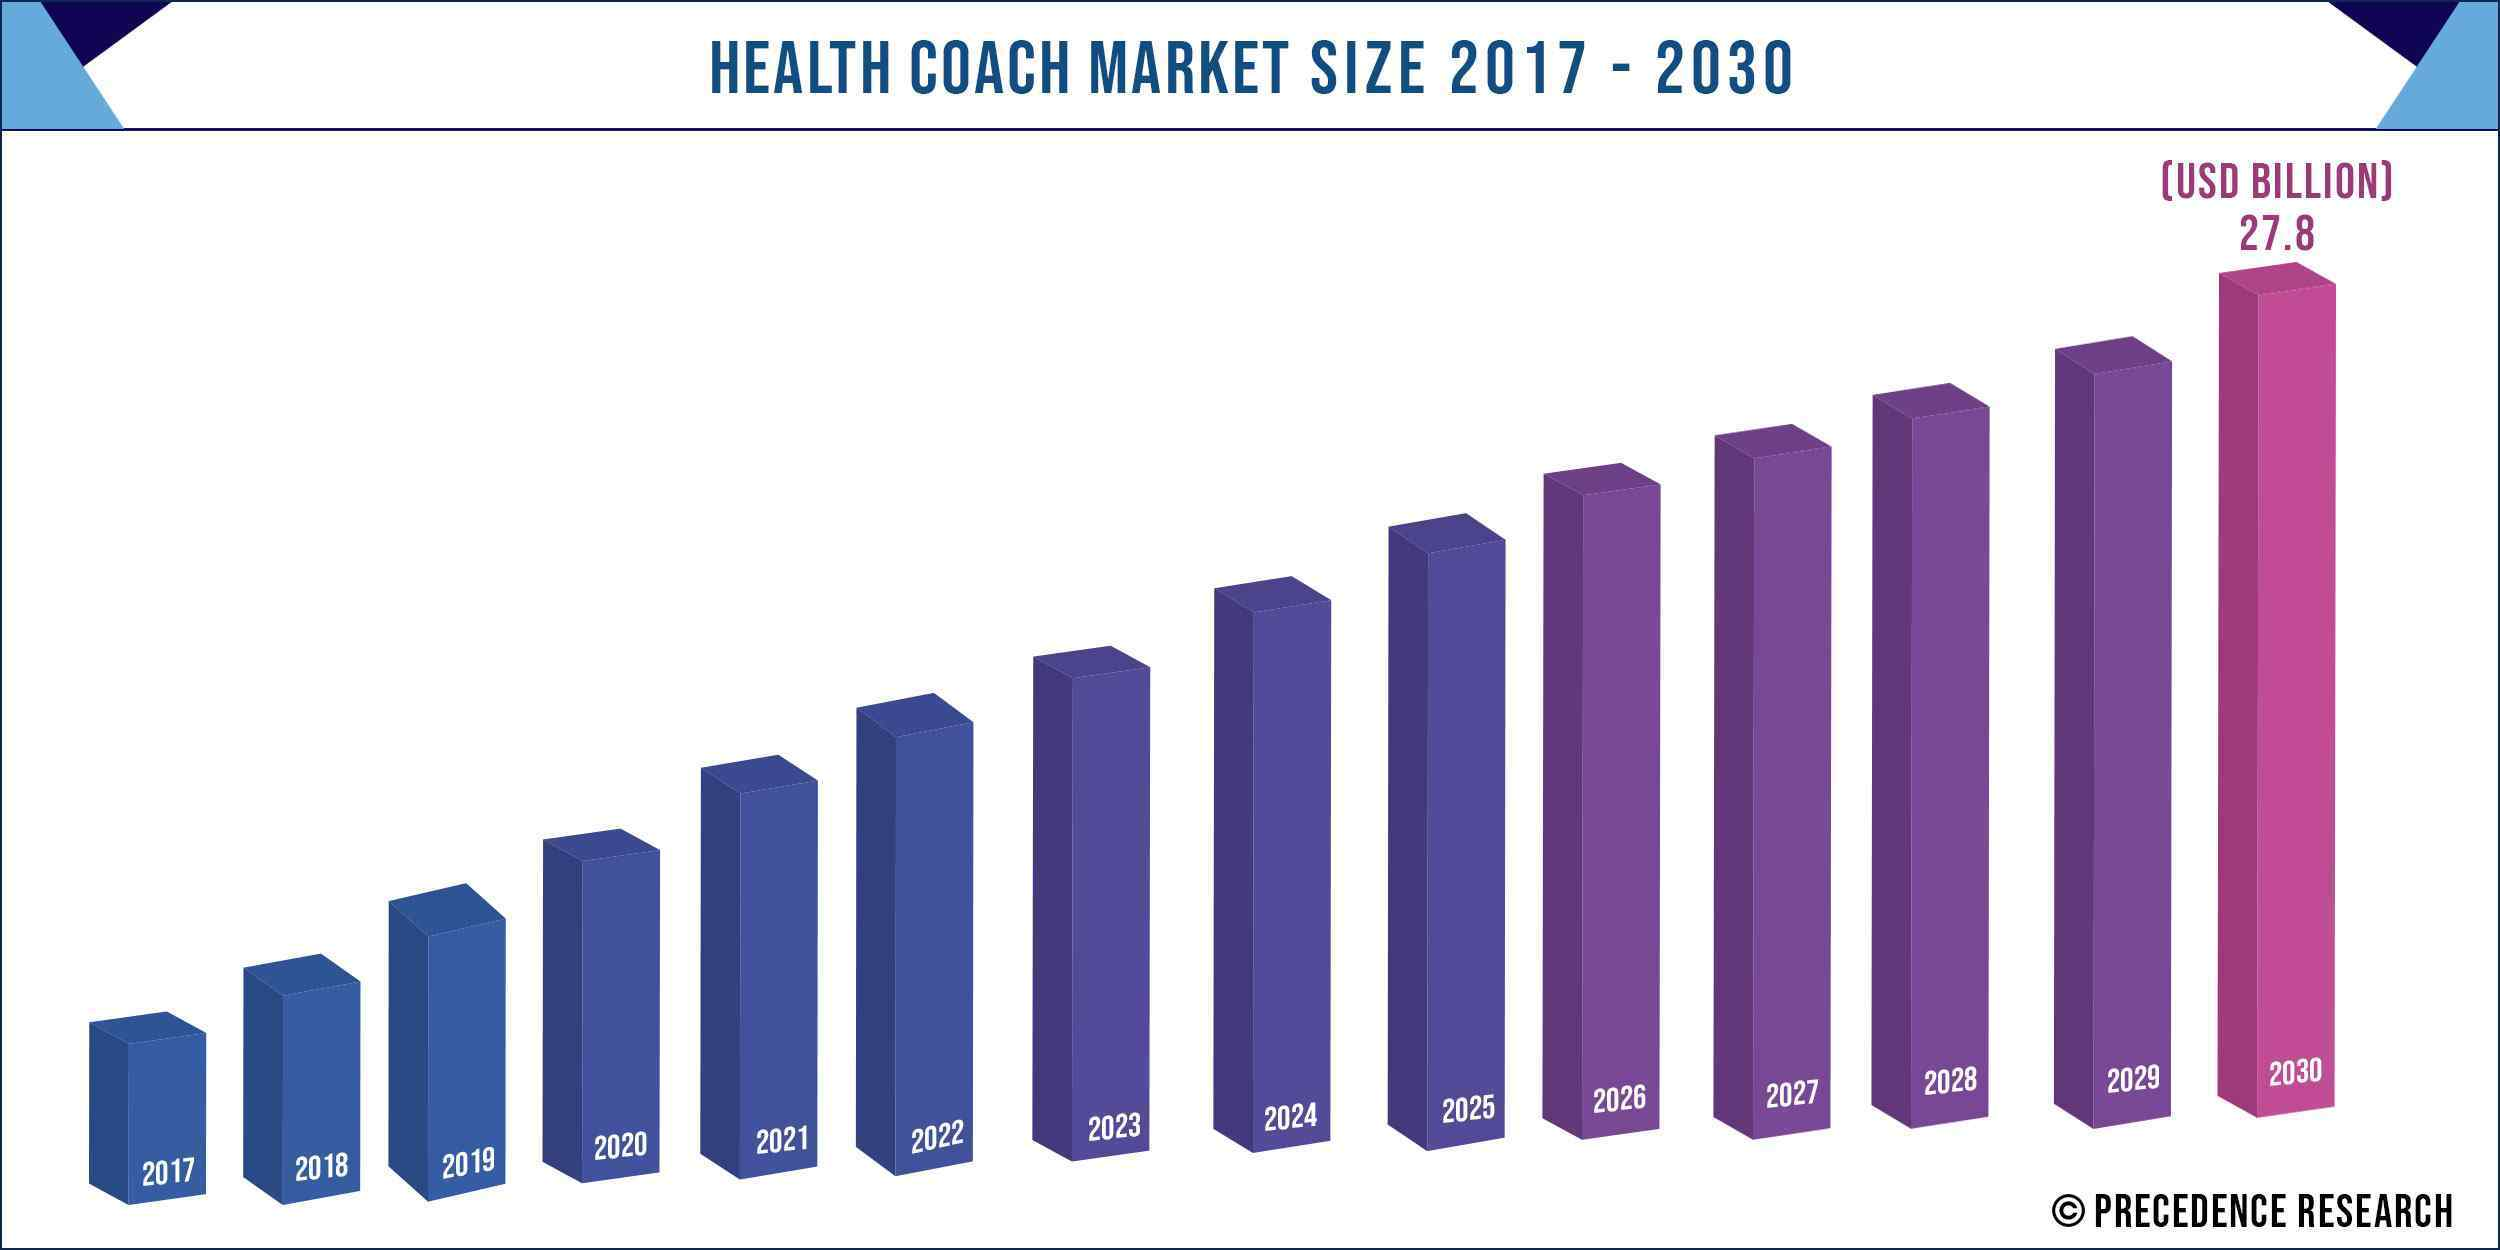 Health Coach Market Size 2017-2030